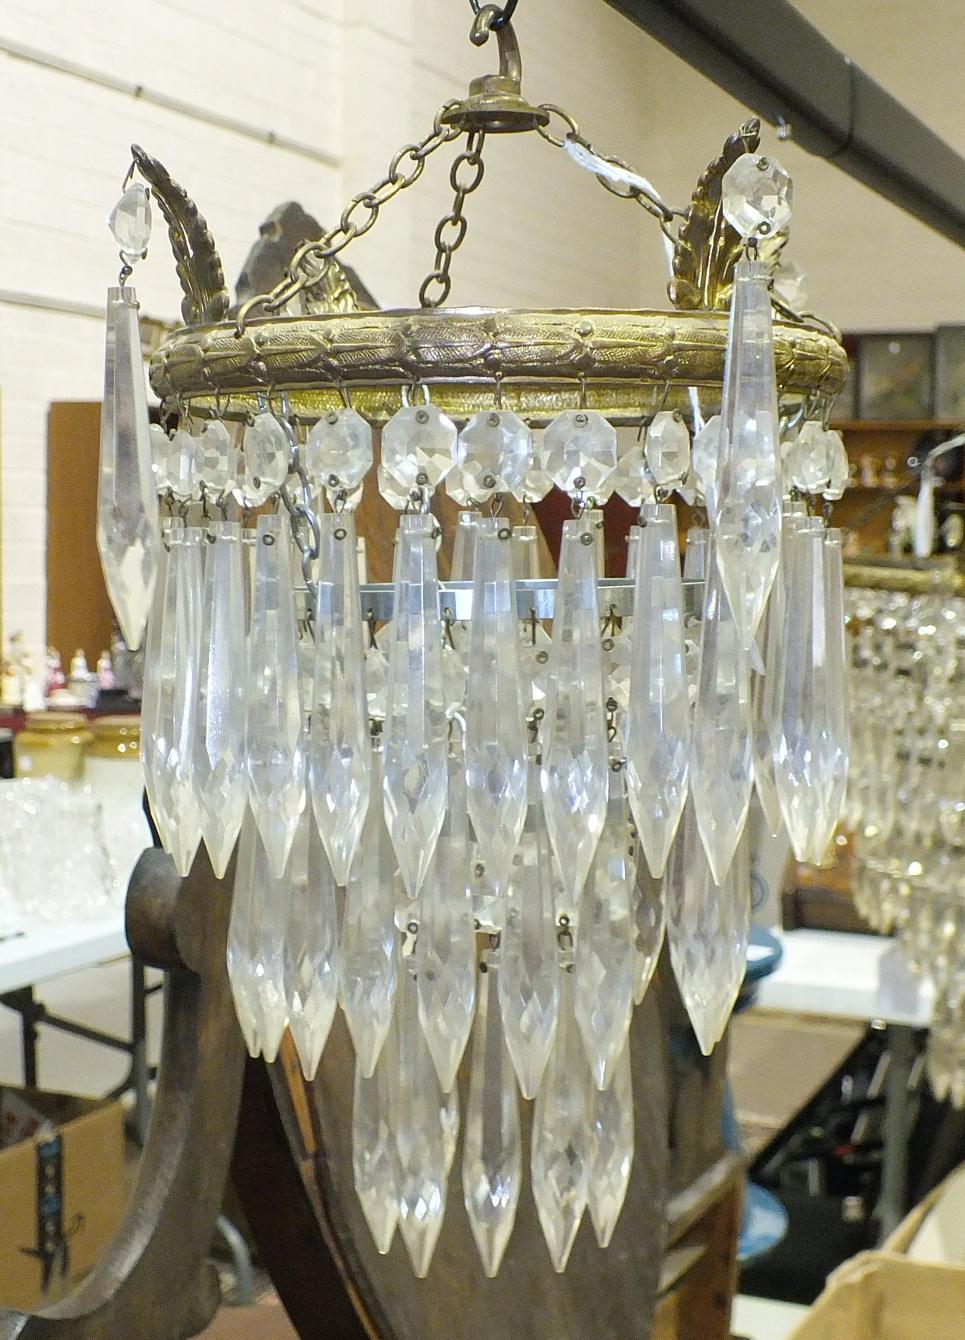 Lot 125 - A circular metal five-tier lustre-drop hanging light fitting, 46cm high, 31cm diameter and a smaller